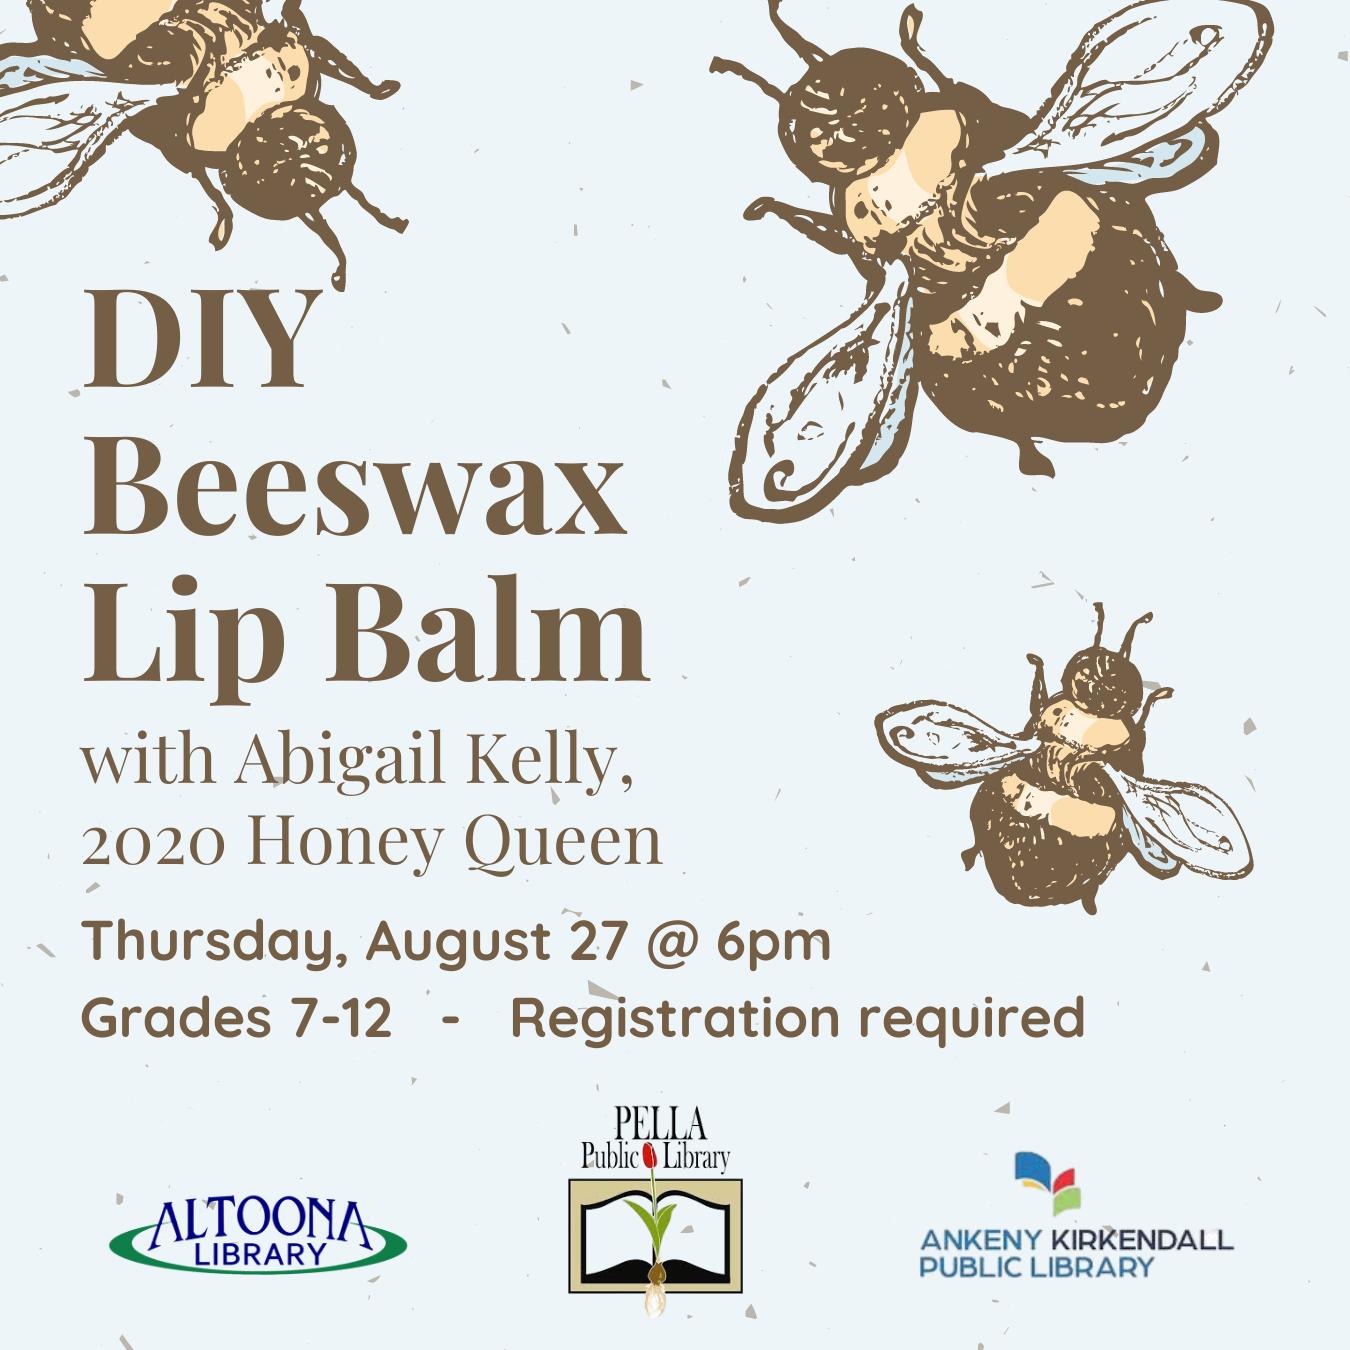 DIY Beeswax Lip Balm (Activity Kit)